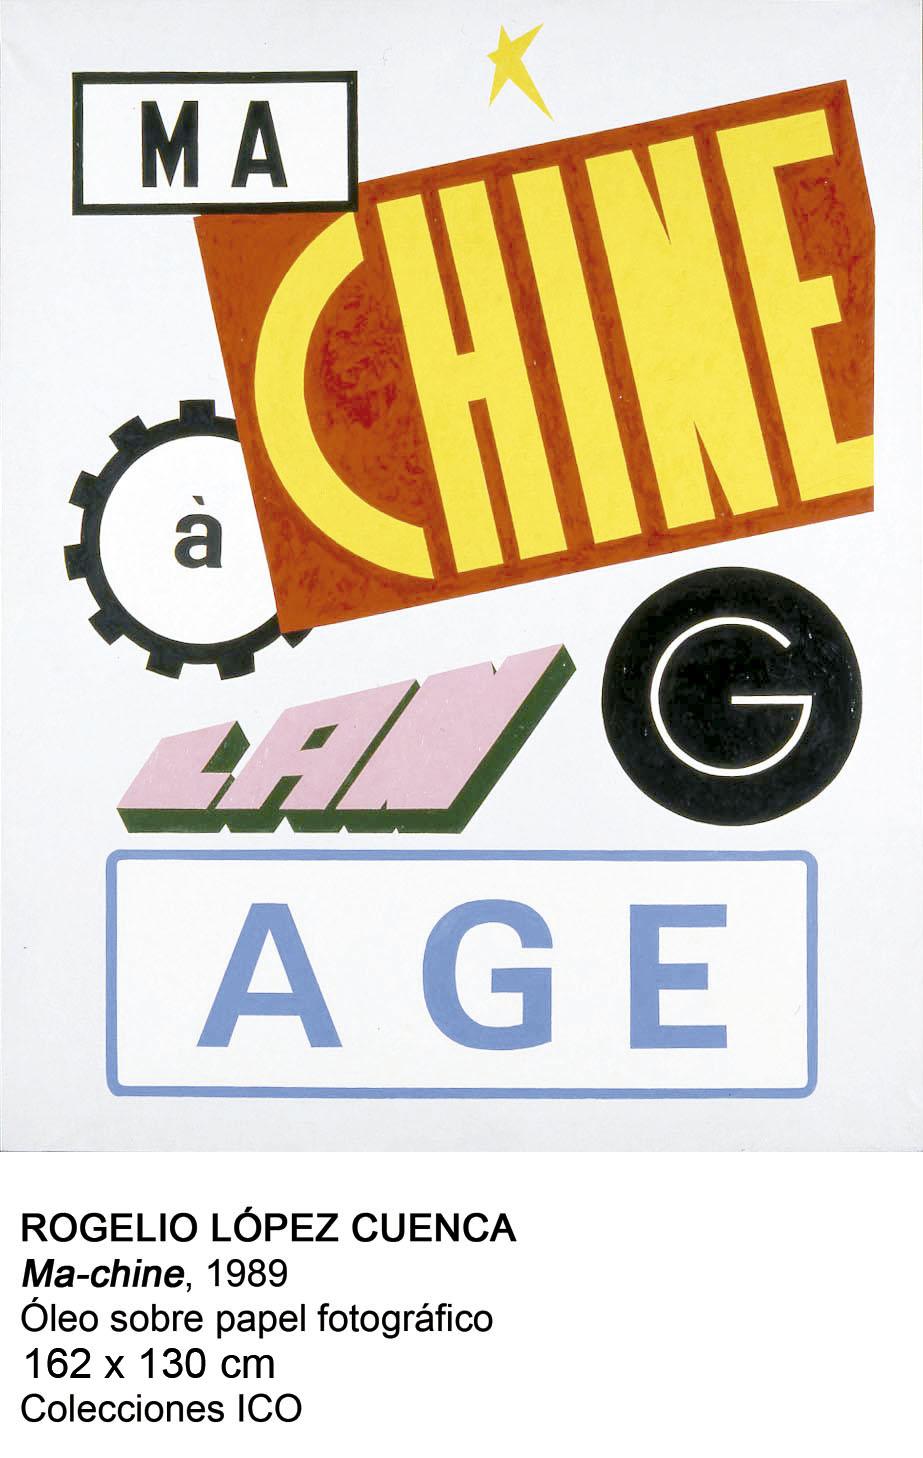 Ma-chine (1989) - Rogelio López Cuenca